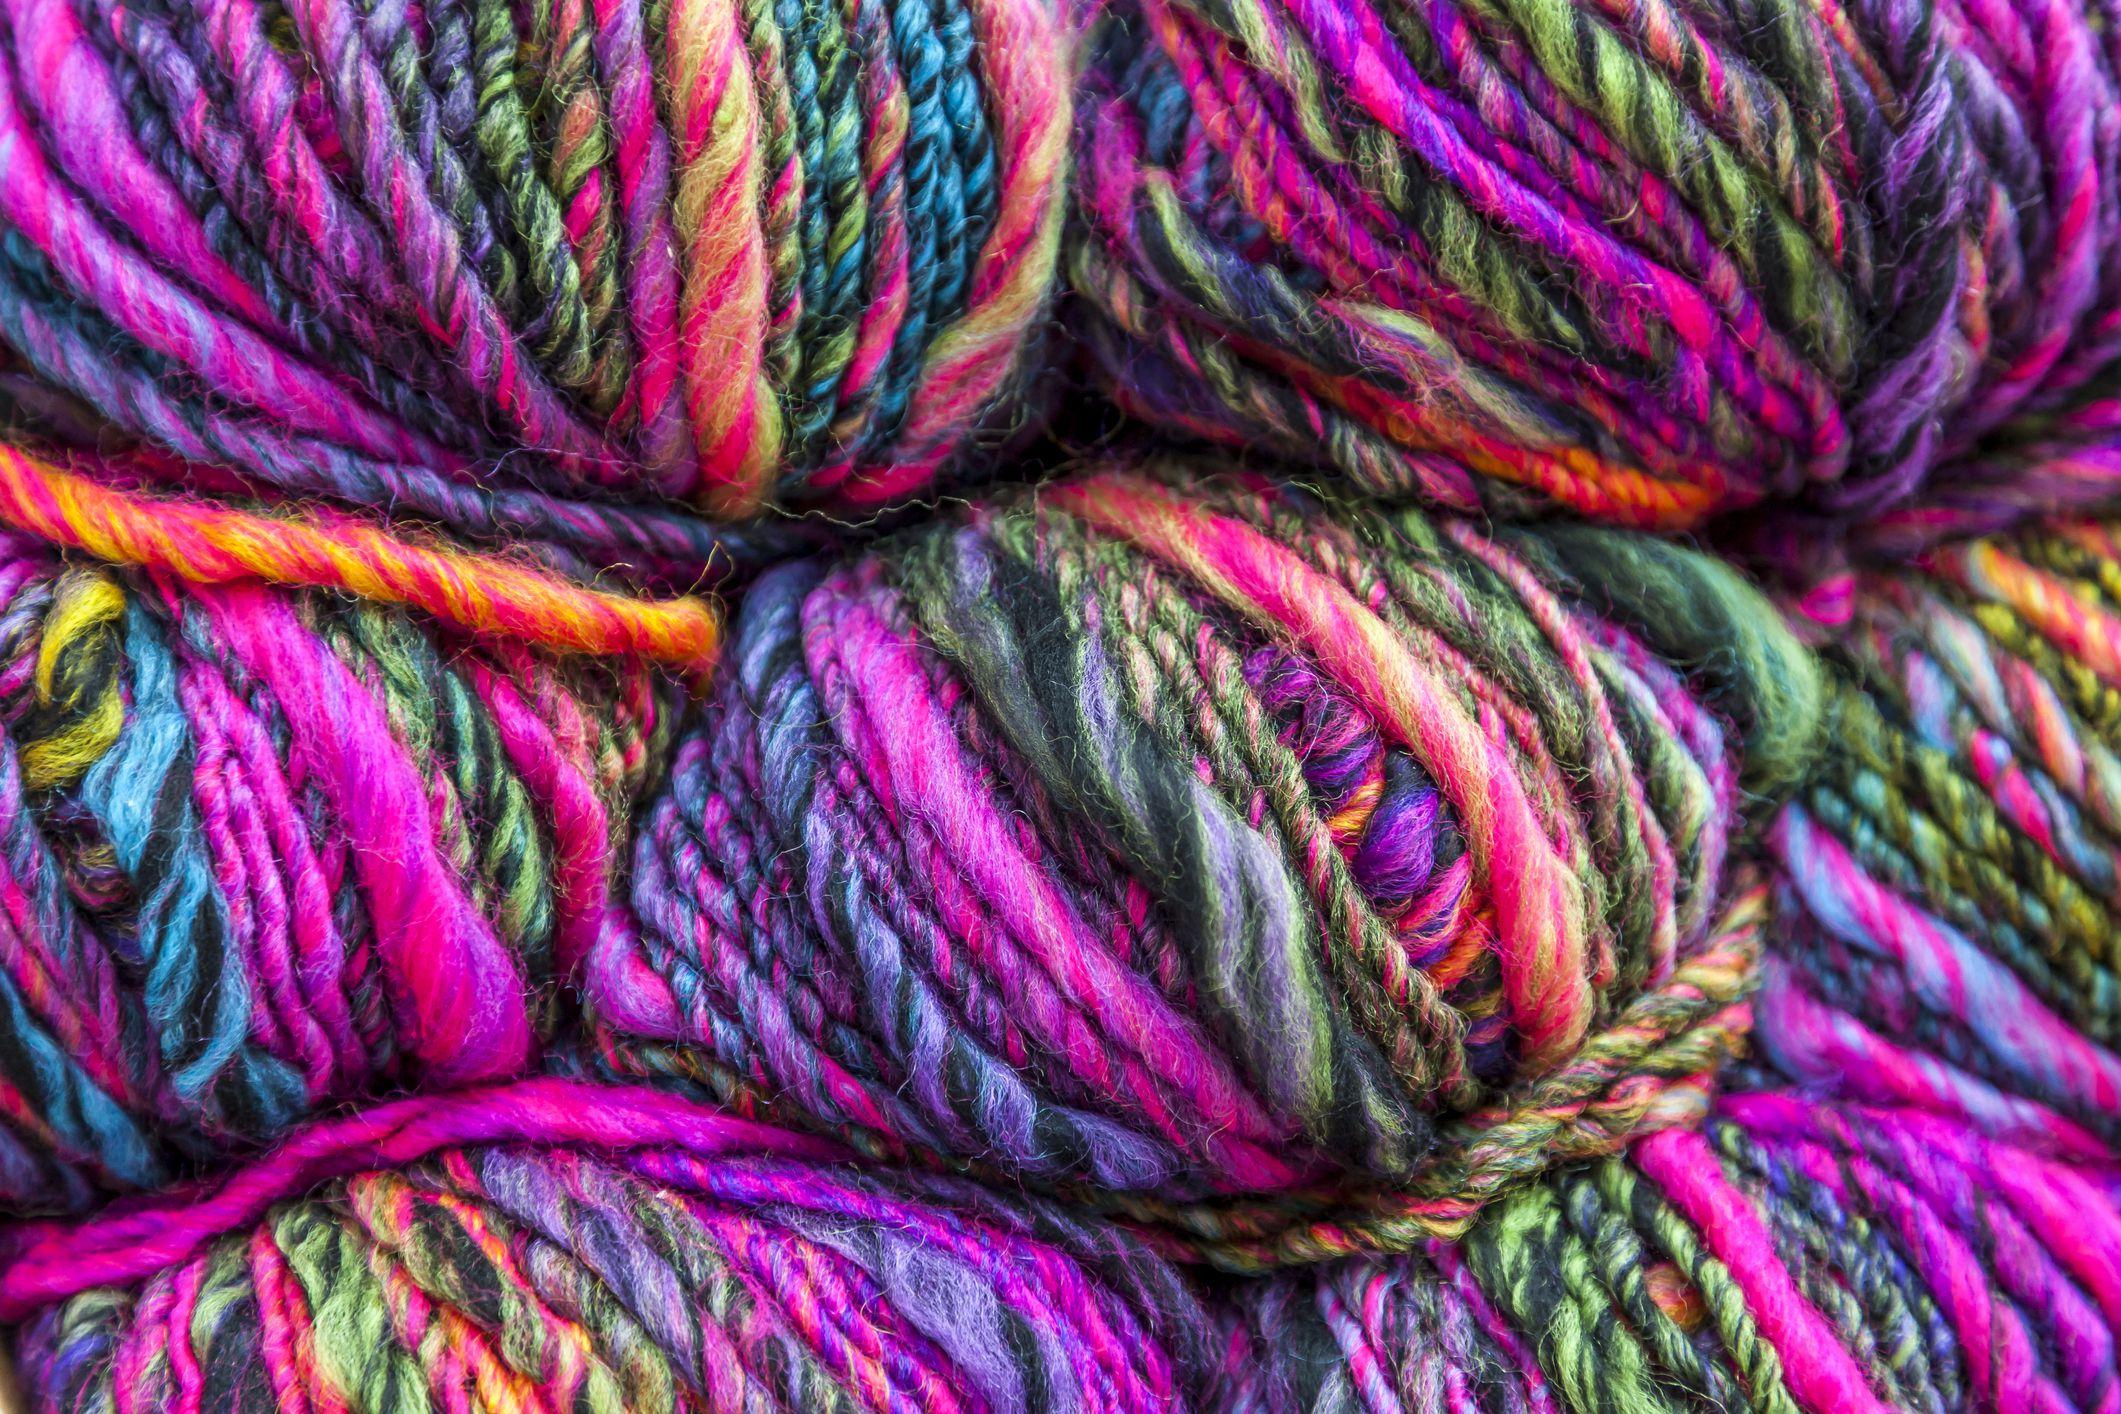 King Cole Riot Chunky 100g Knitting Yarn Rainbow (623) | C&H